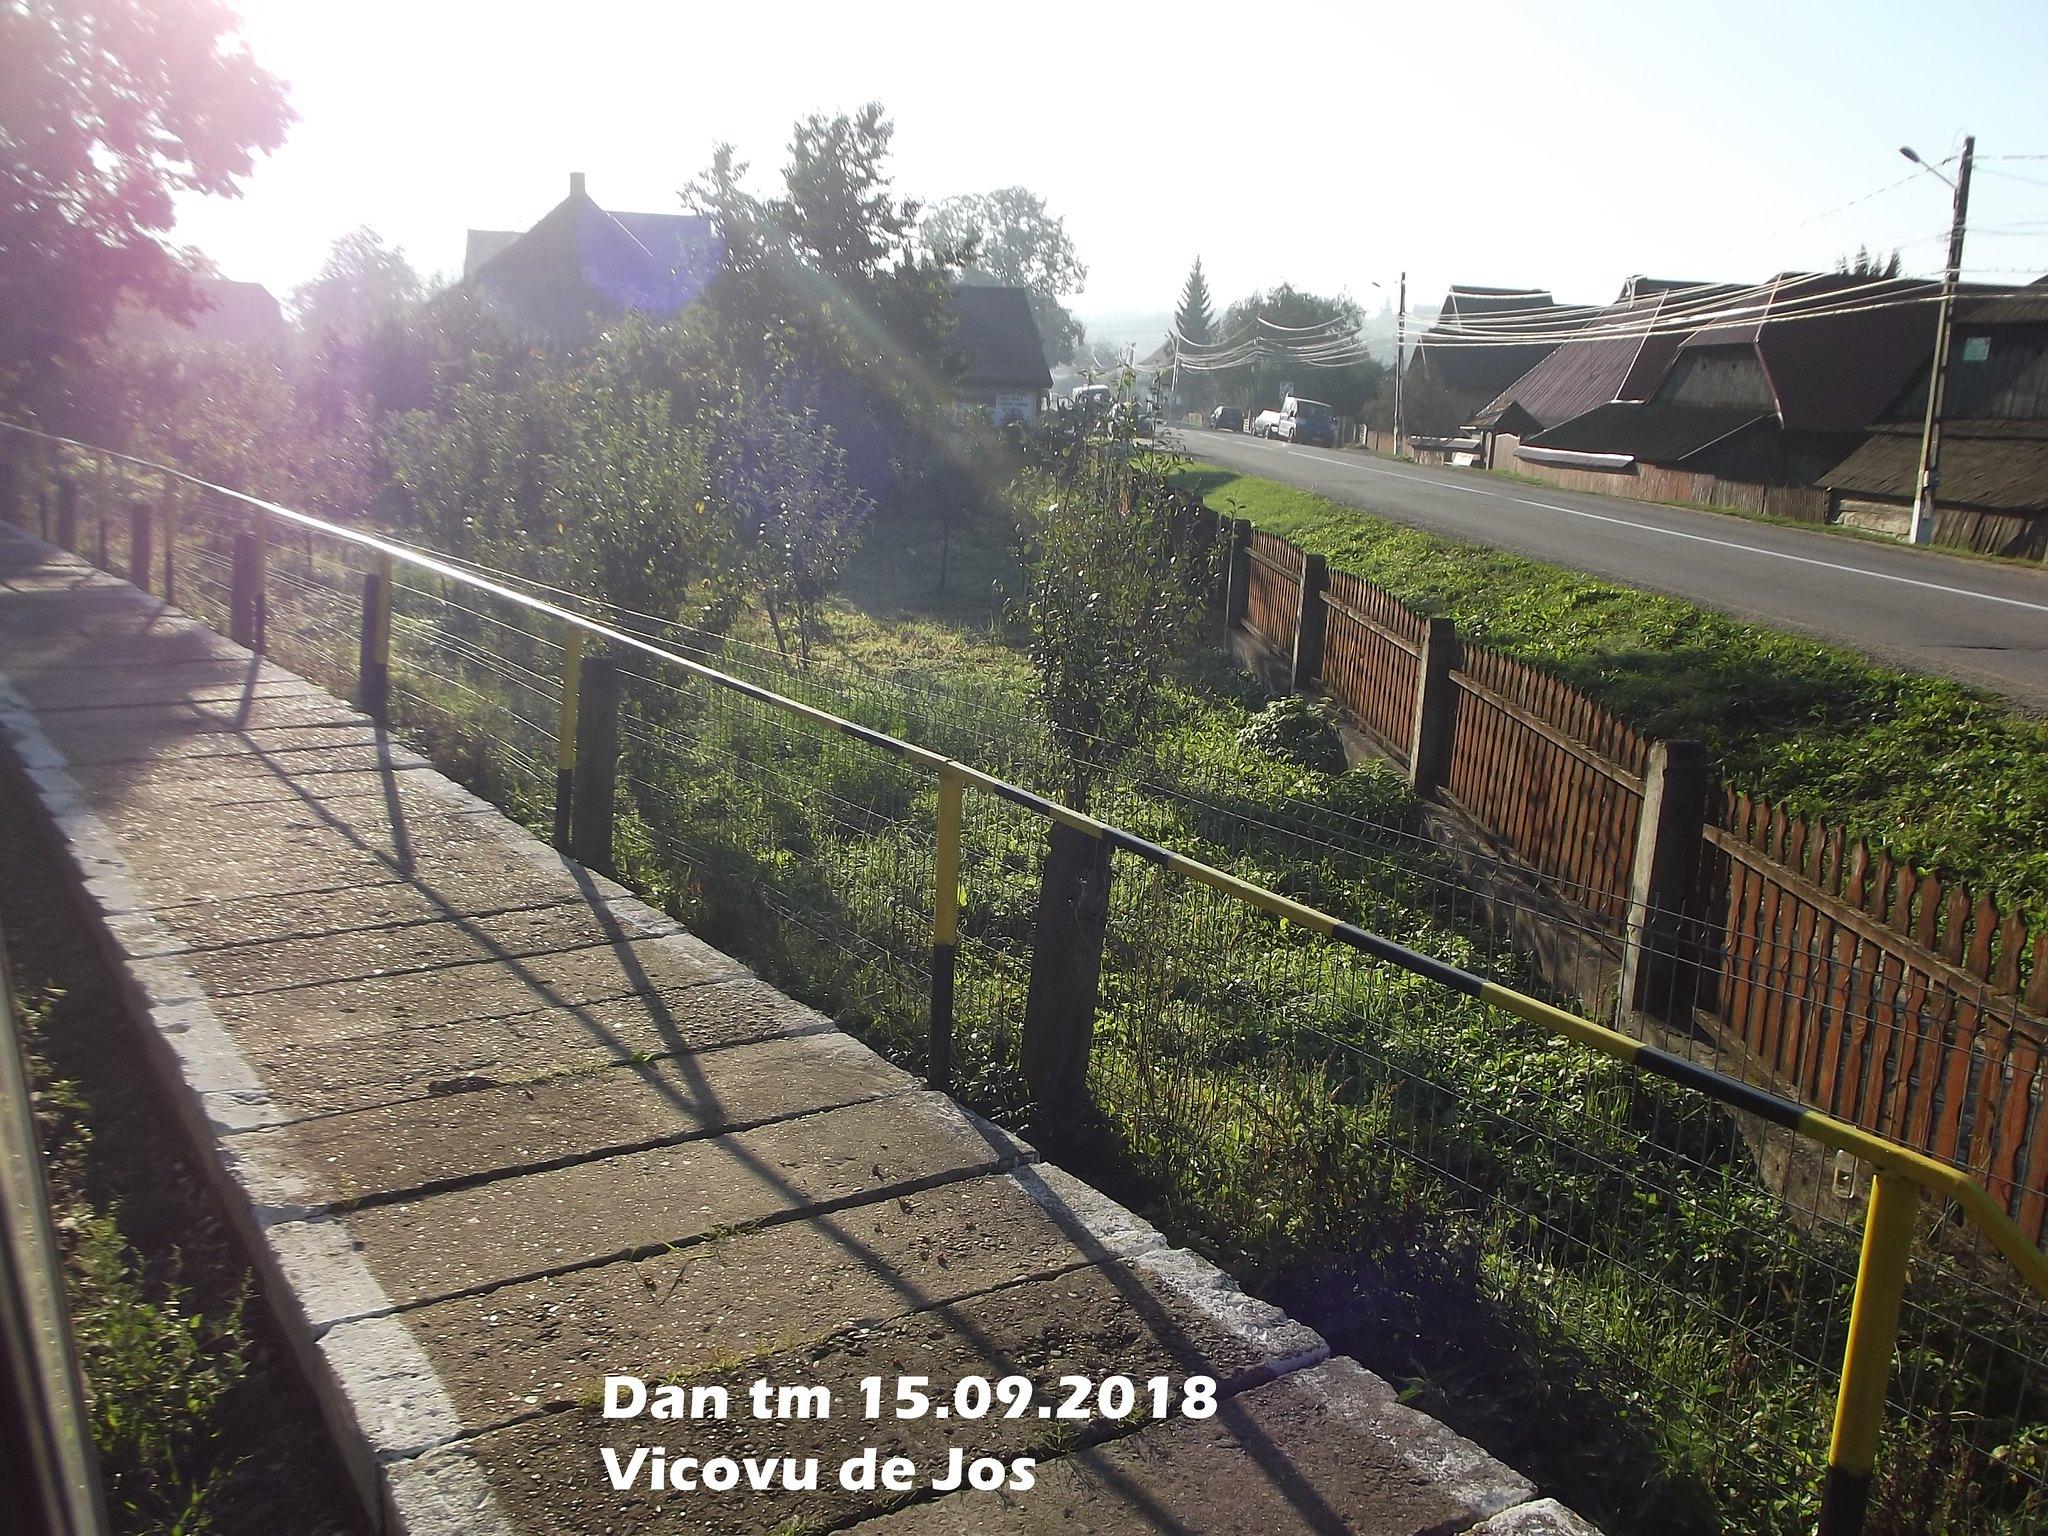 515 : Dorneşti - Gura Putnei - (Putna) - Nisipitu - Seletin UKR - Pagina 47 44685366872_8ca8748e3b_k